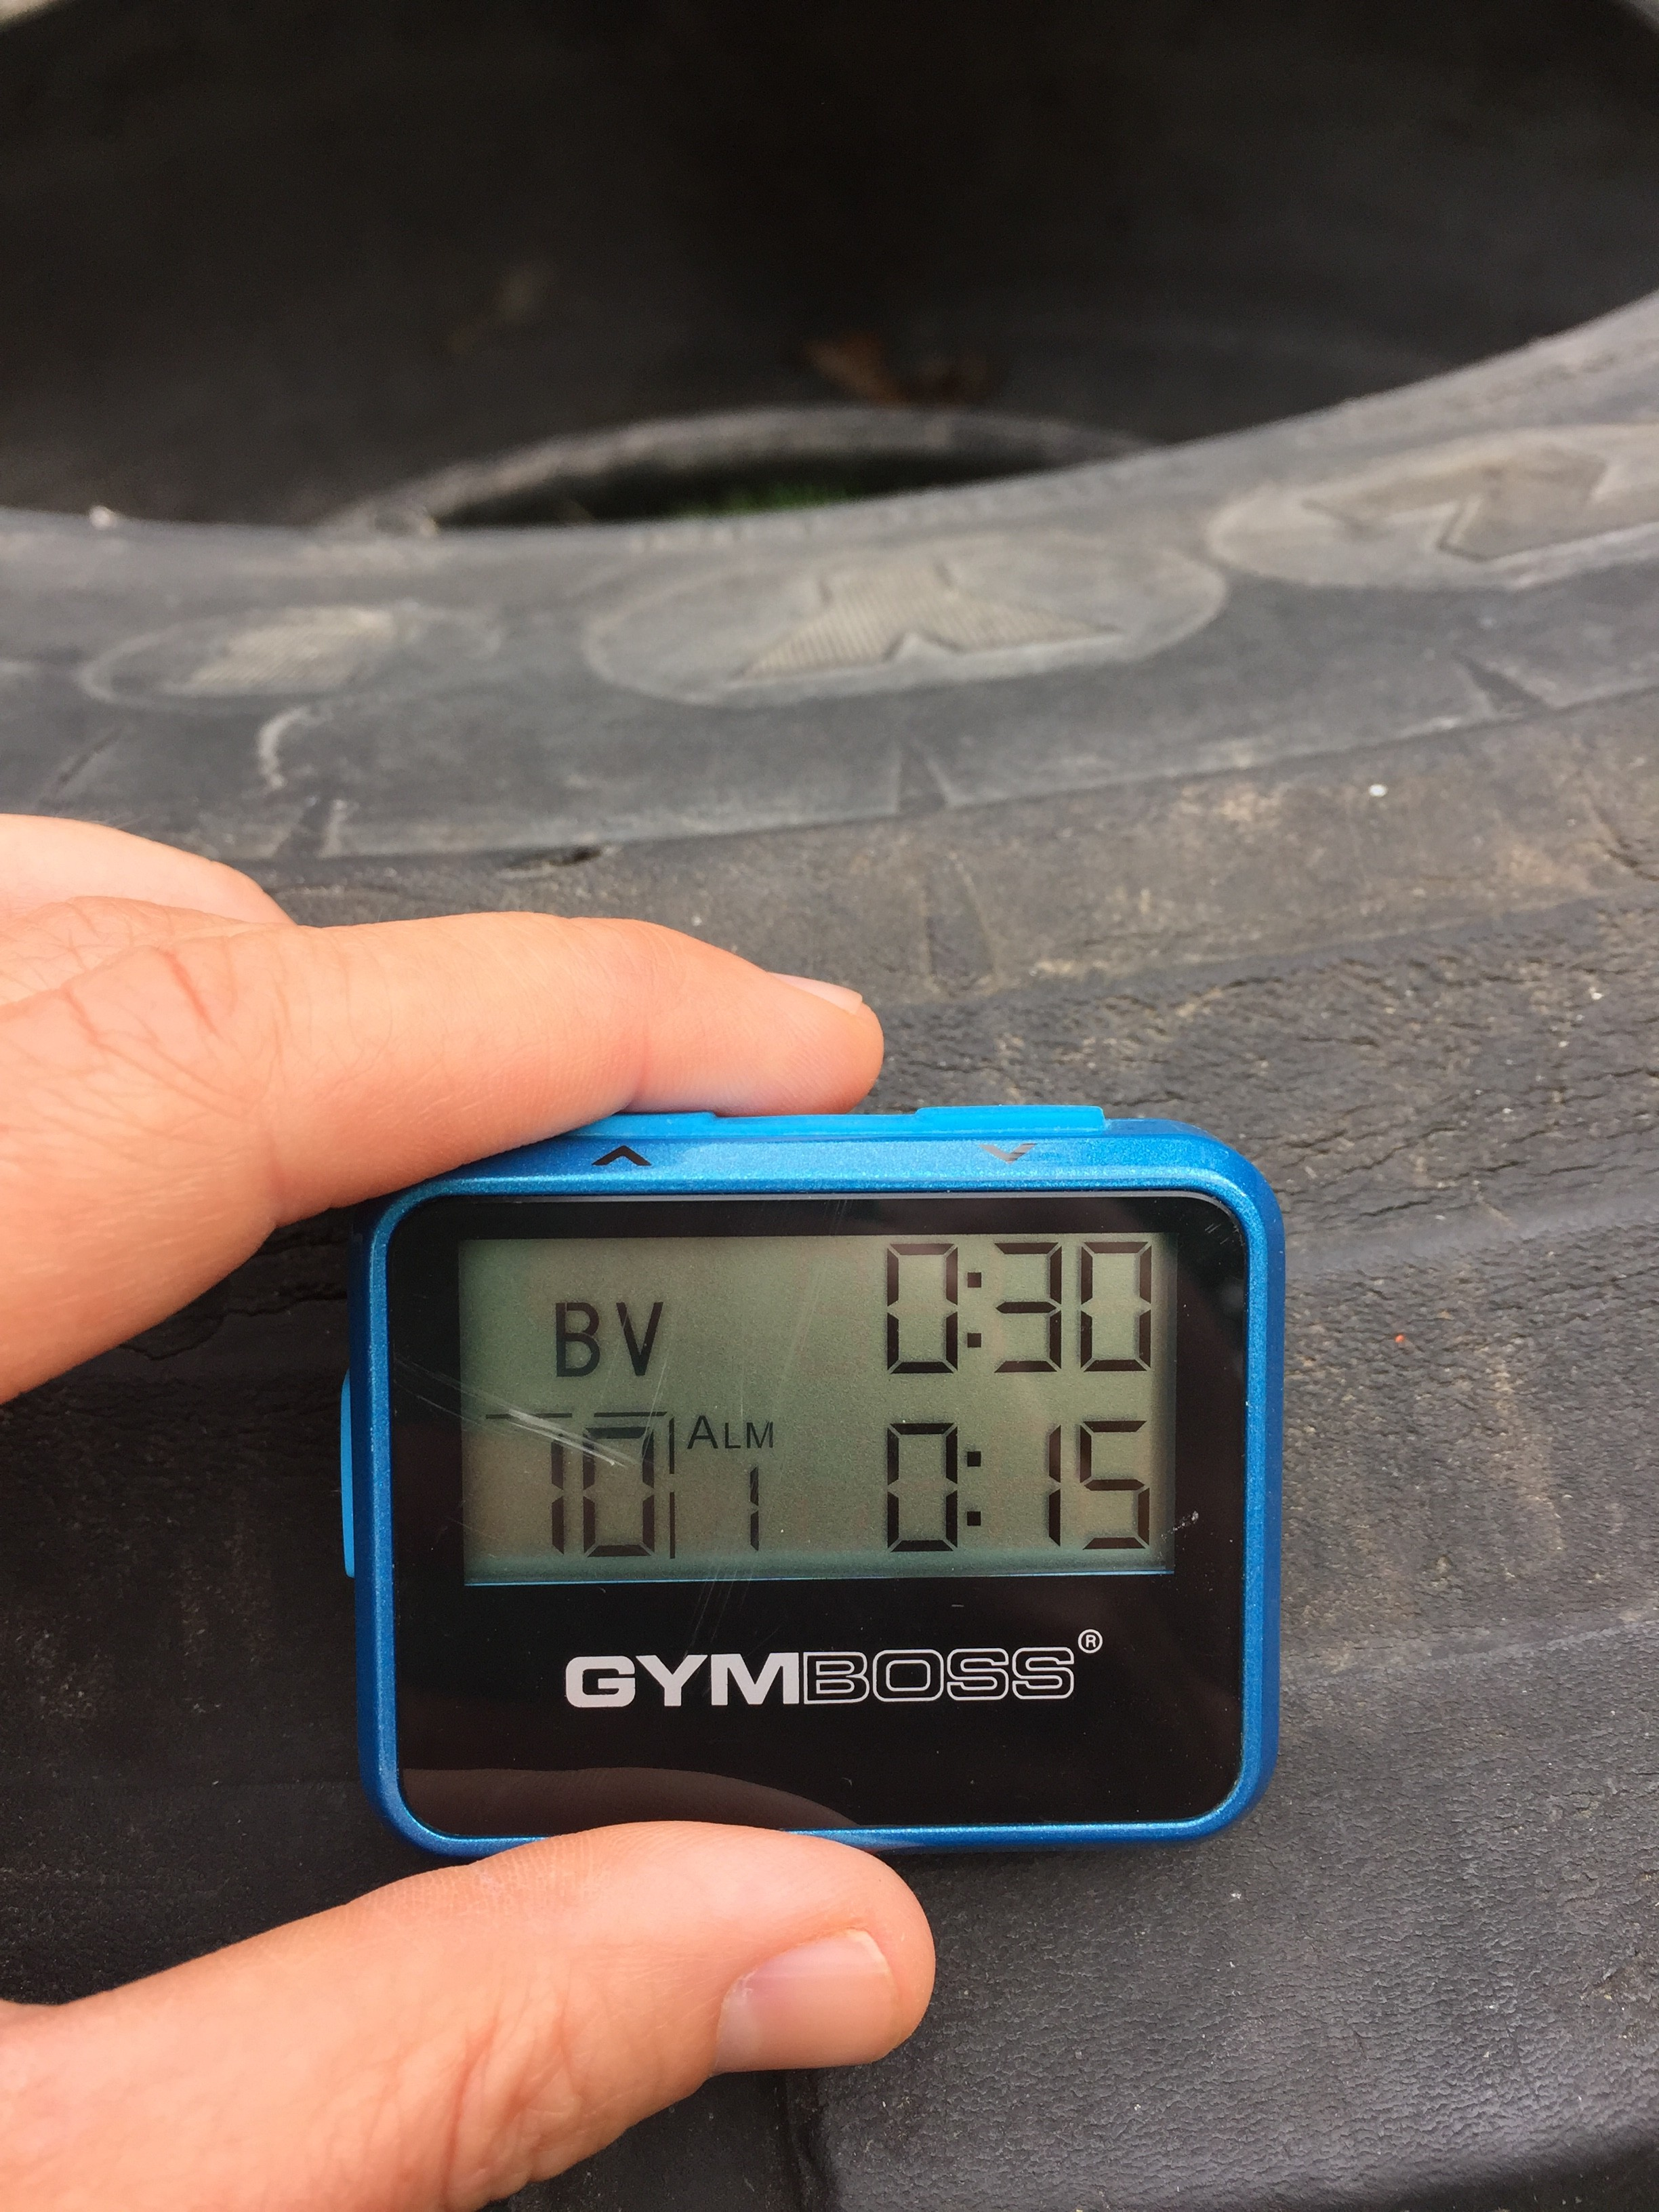 30 Minute Hiit Tire Circuit Workout Gymboss Blog Tabata Workouts Pinterest